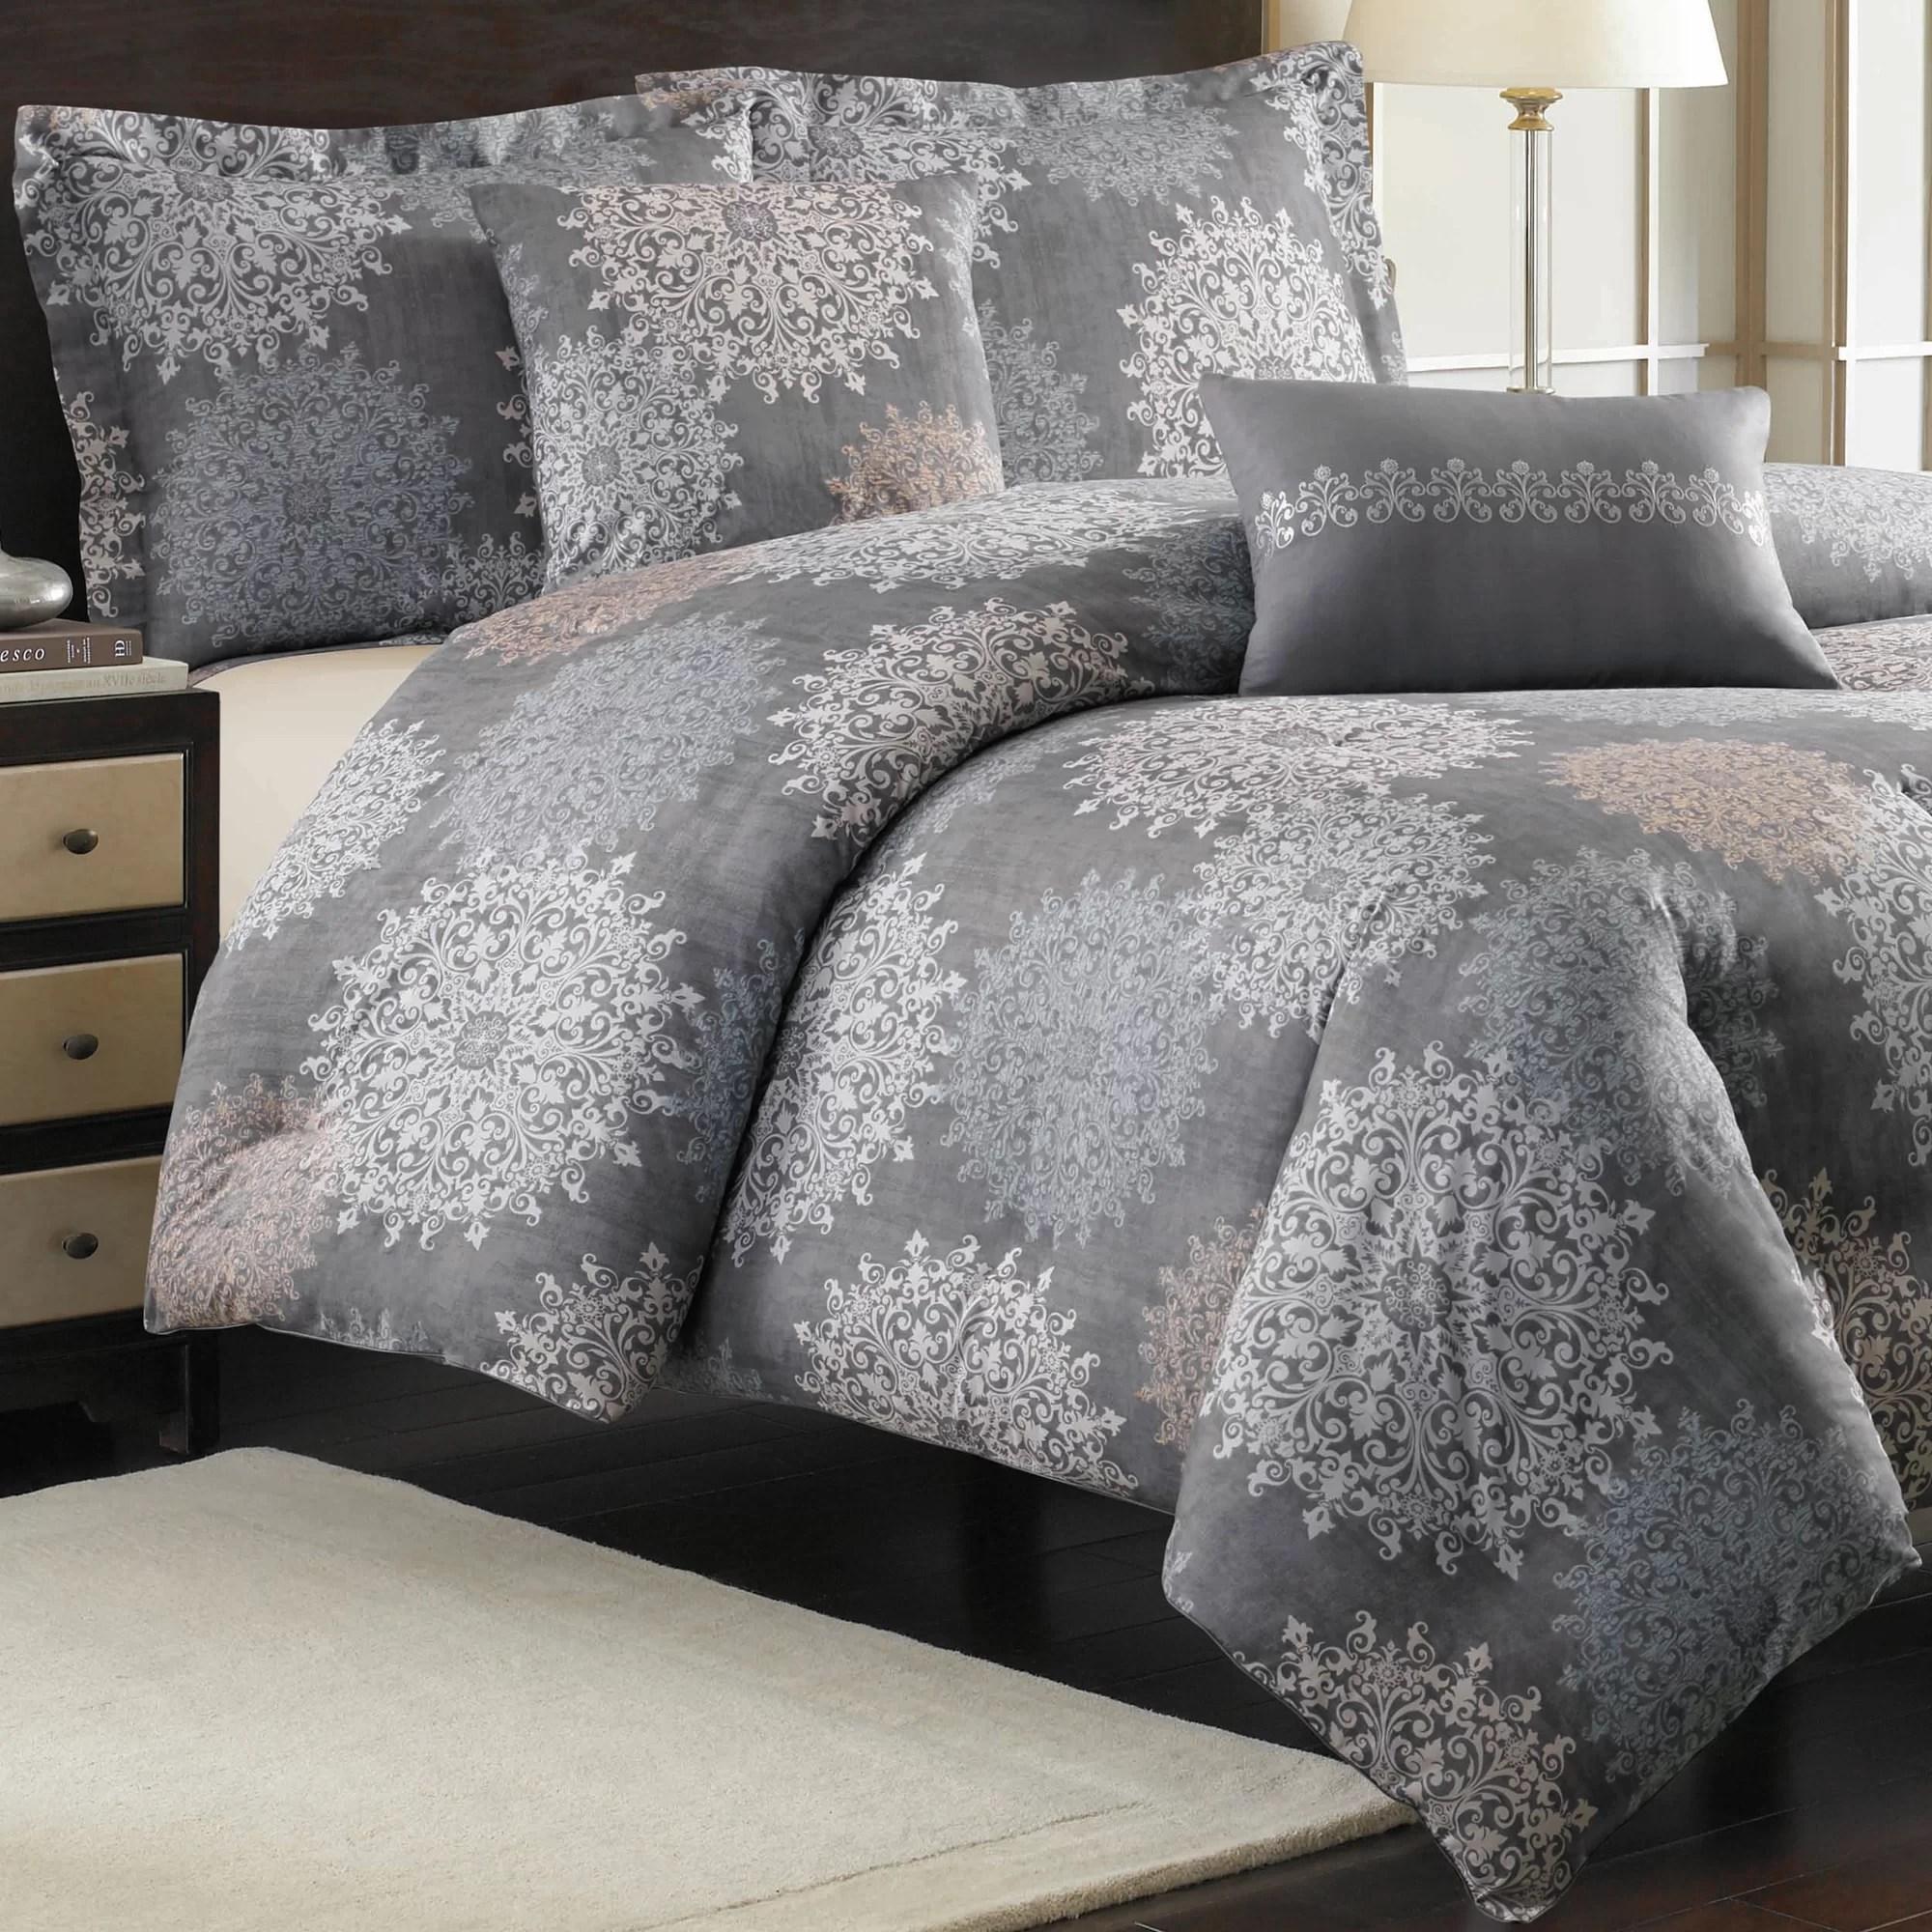 Nicole Miller Home Cortina Comforter Set  eBay